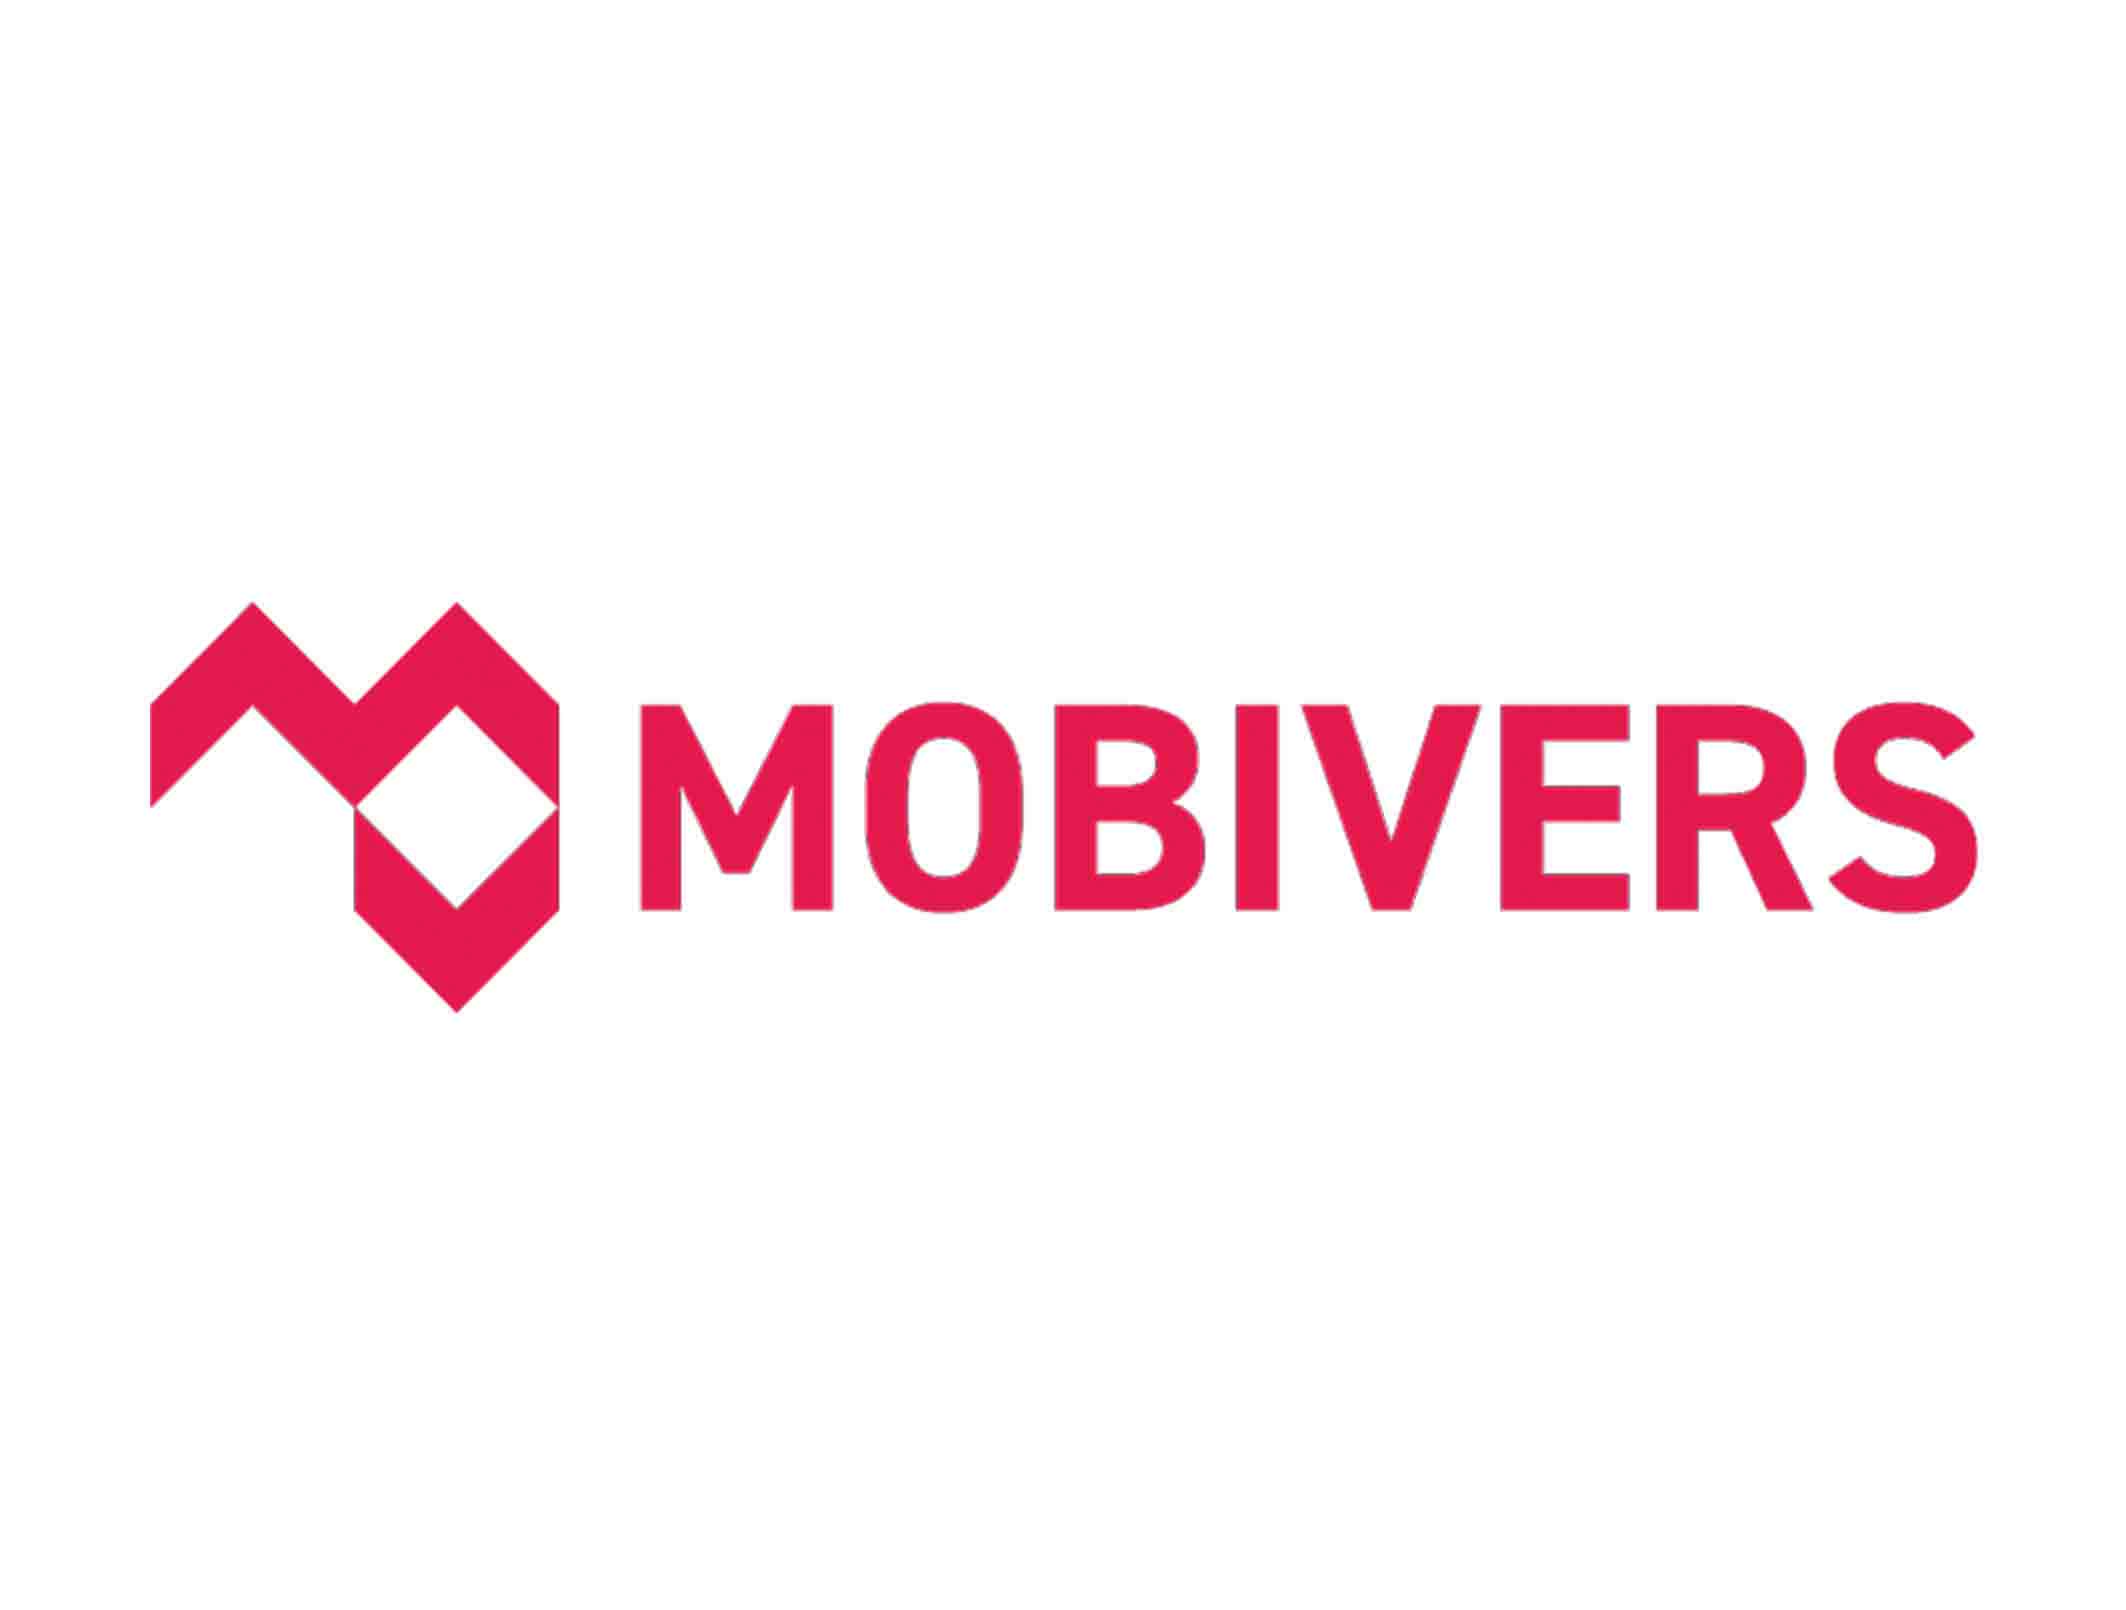 mobivers